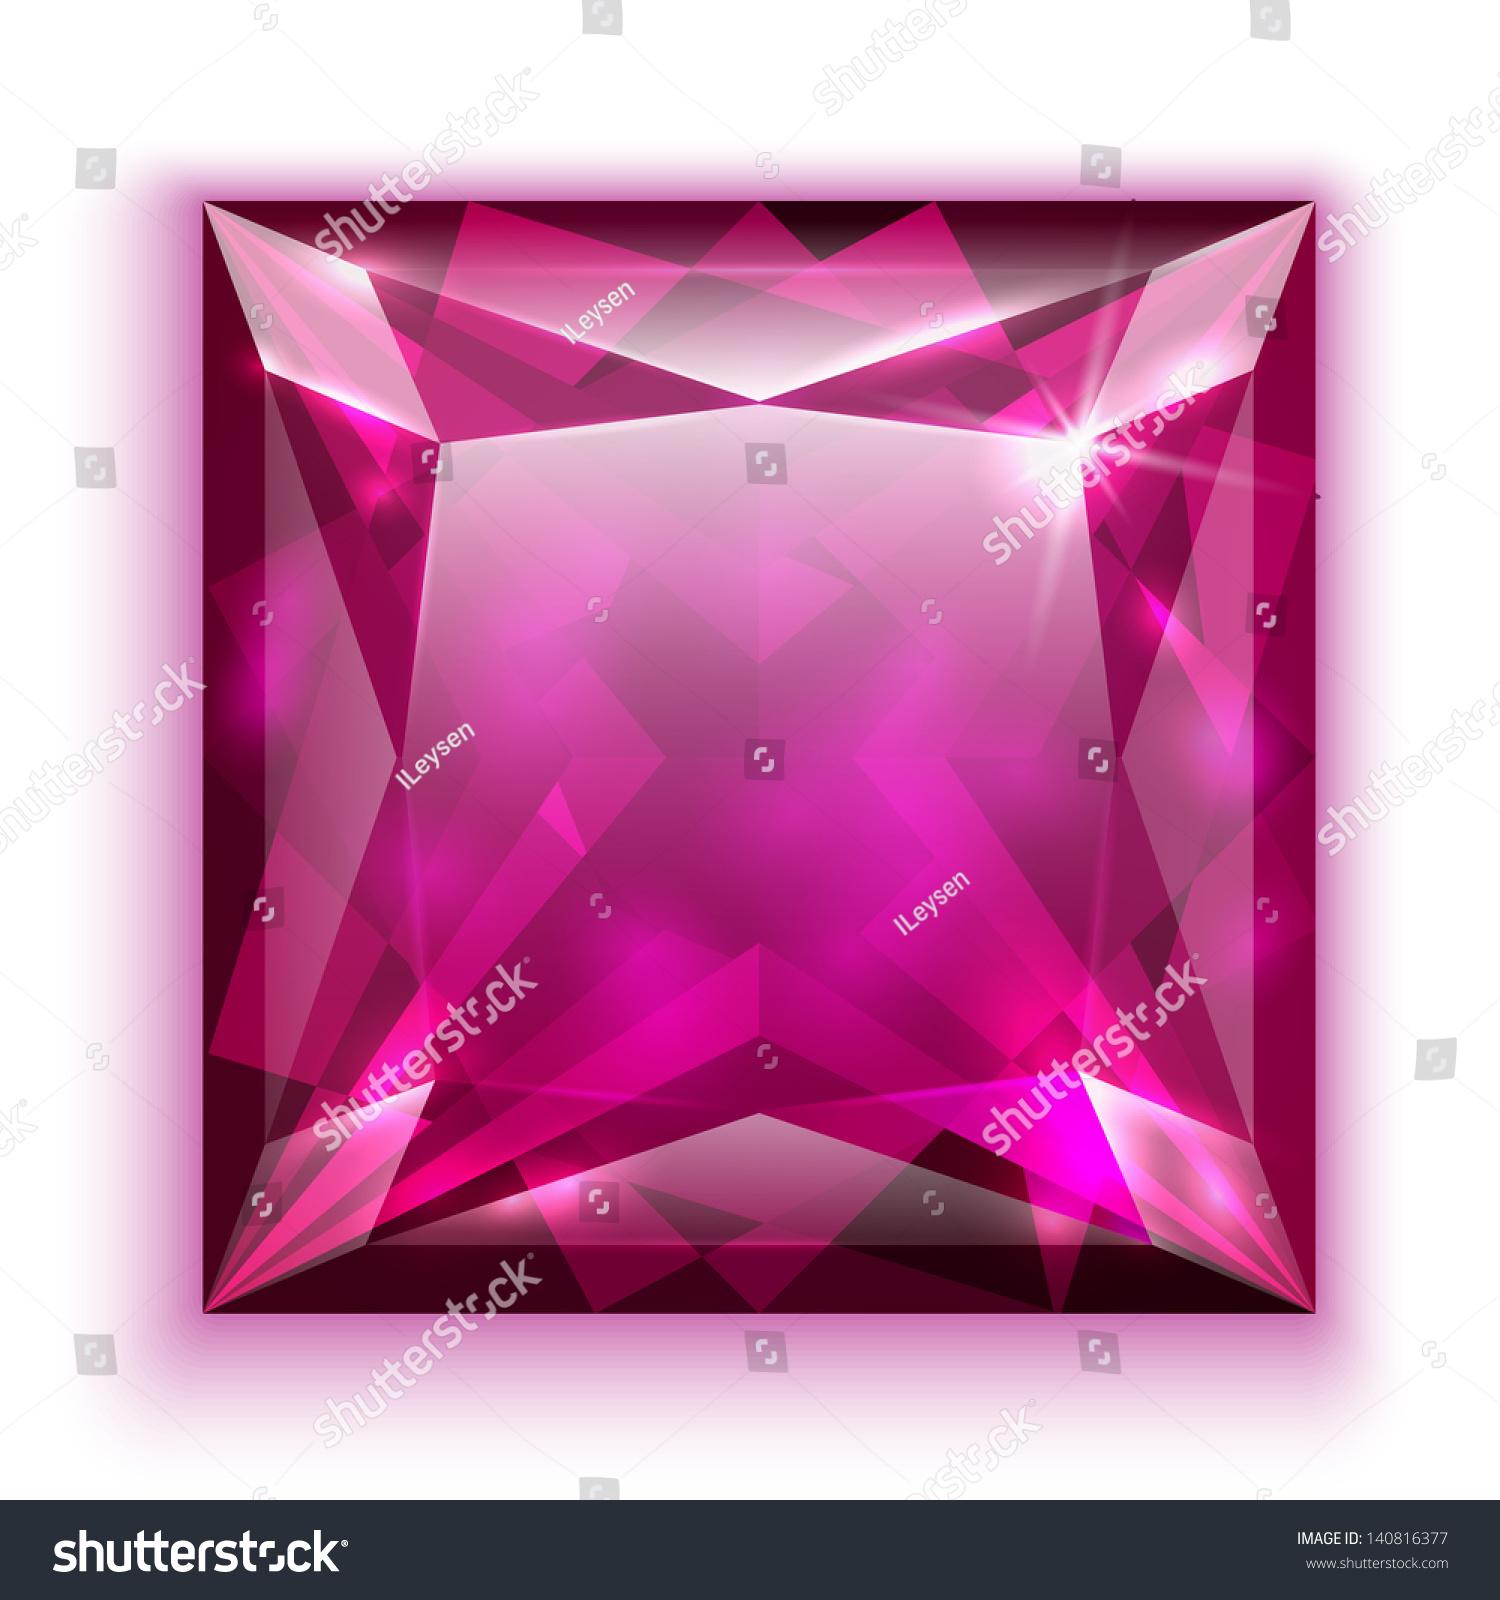 Princess Cut Pink Diamond Icon Eps 10 Stock Vector (Royalty Free ...